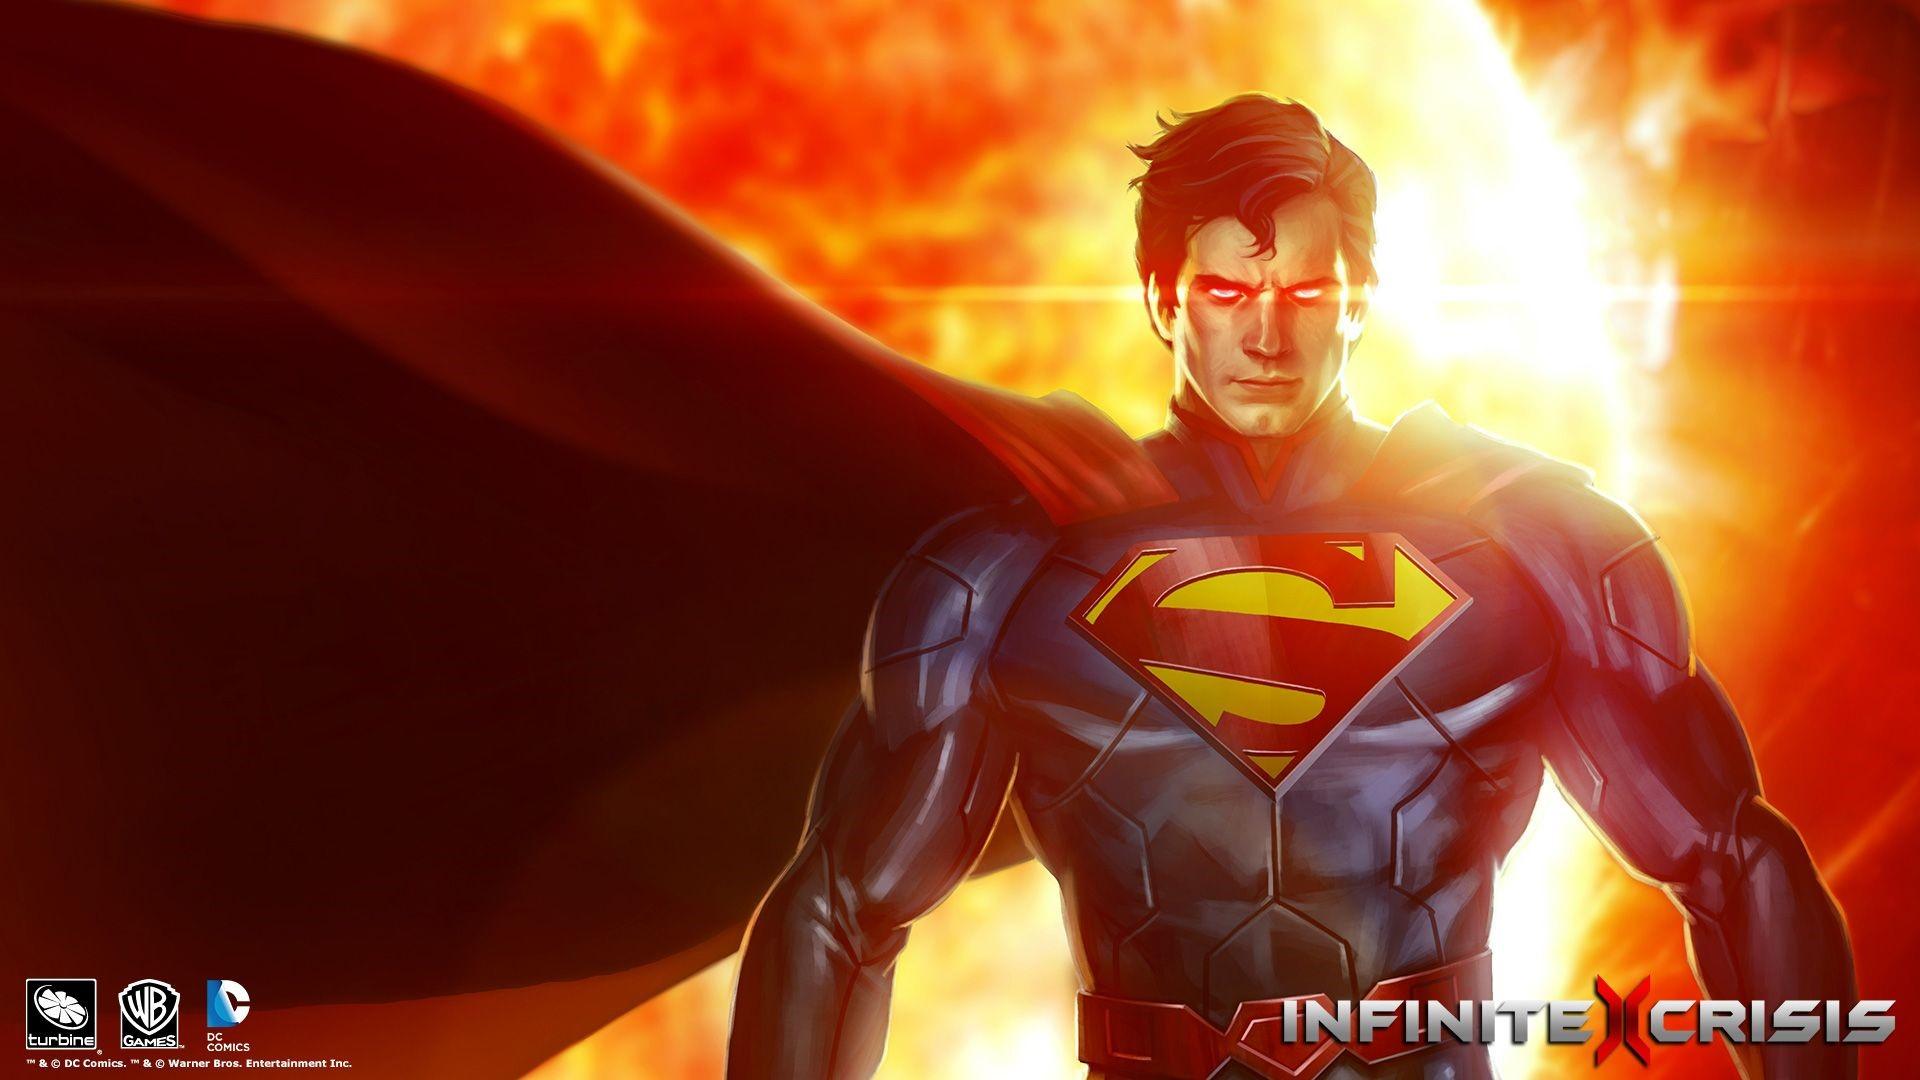 Superman Game Wallpaper